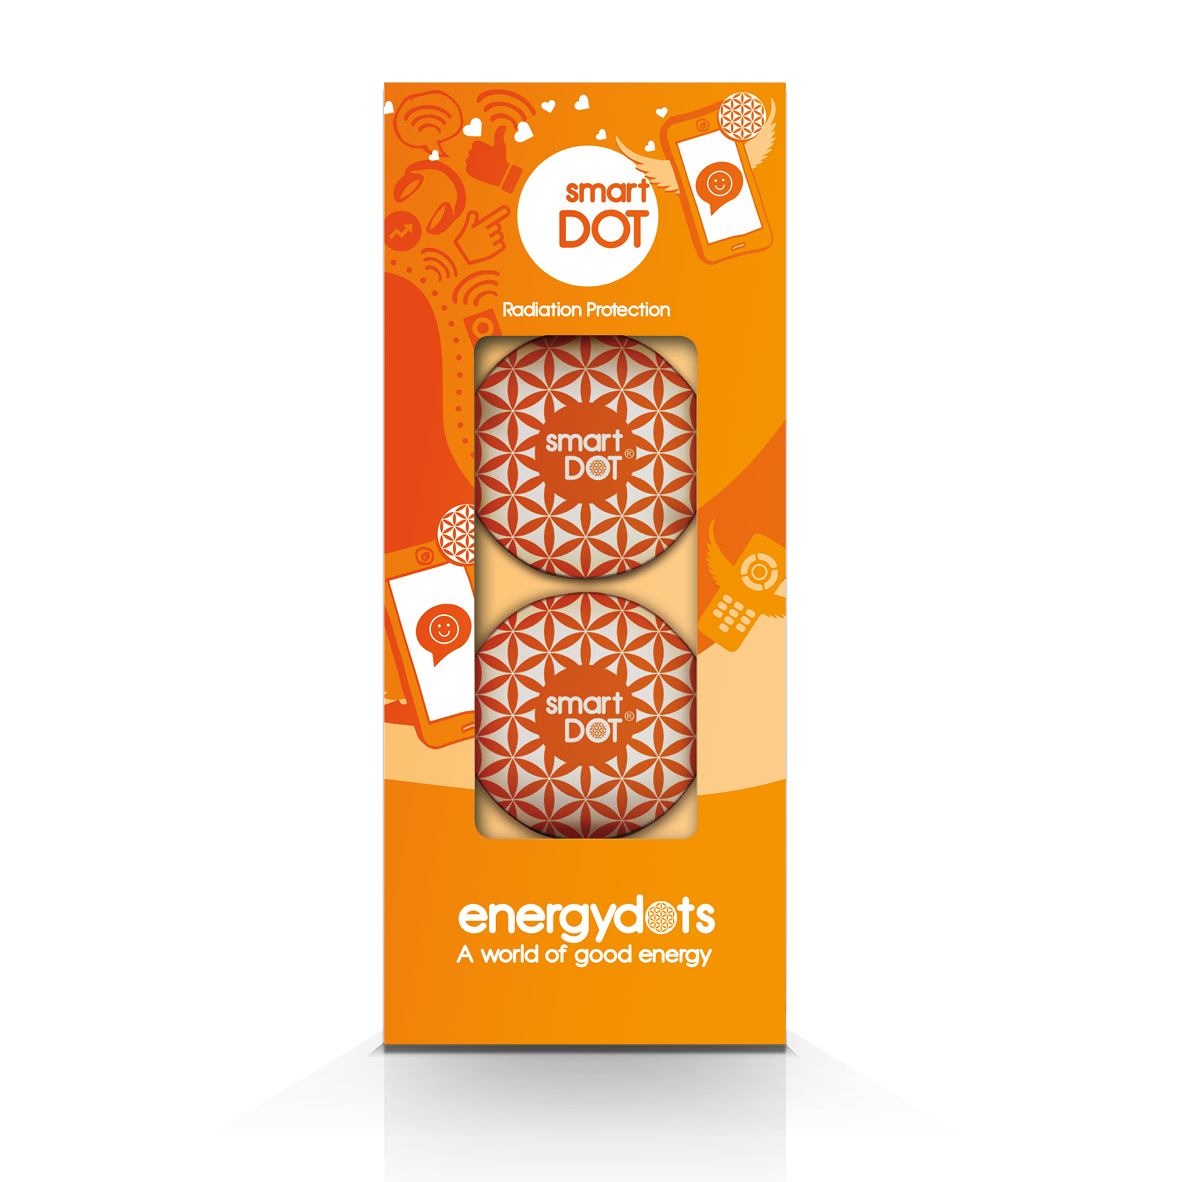 EnergyDOTS NL smartDOT